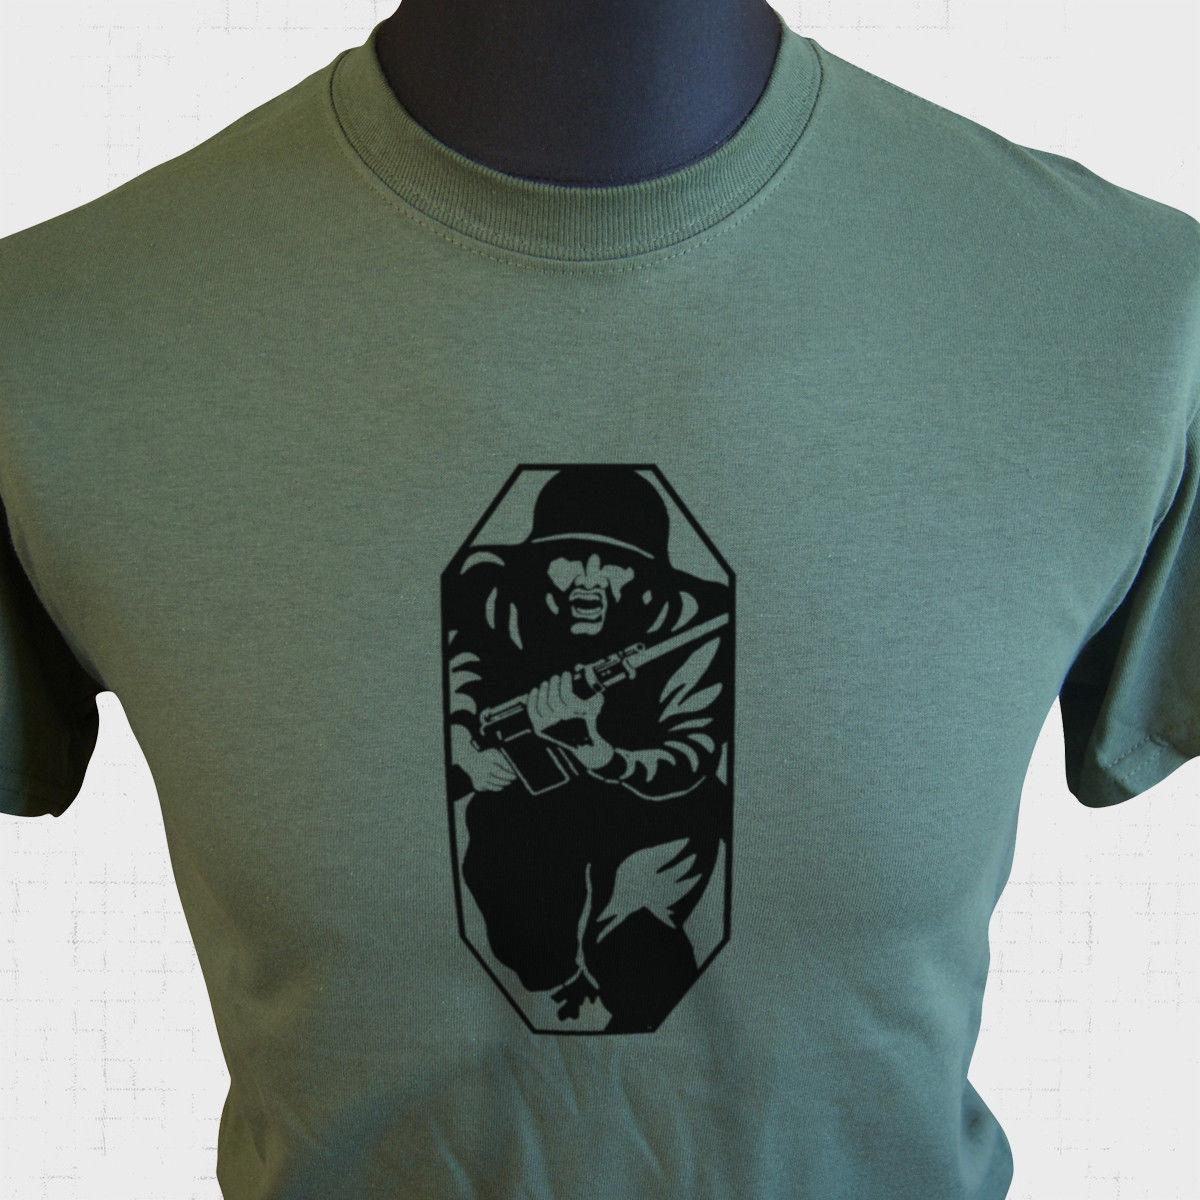 faa02ec31 Army Shooting Range Target Style T Shirt Sniper Practice Rifle Gun Military  New T Shirts Funny Tops Tee New Unisex Funny Tops Custom T Shirts T Shirt  ...